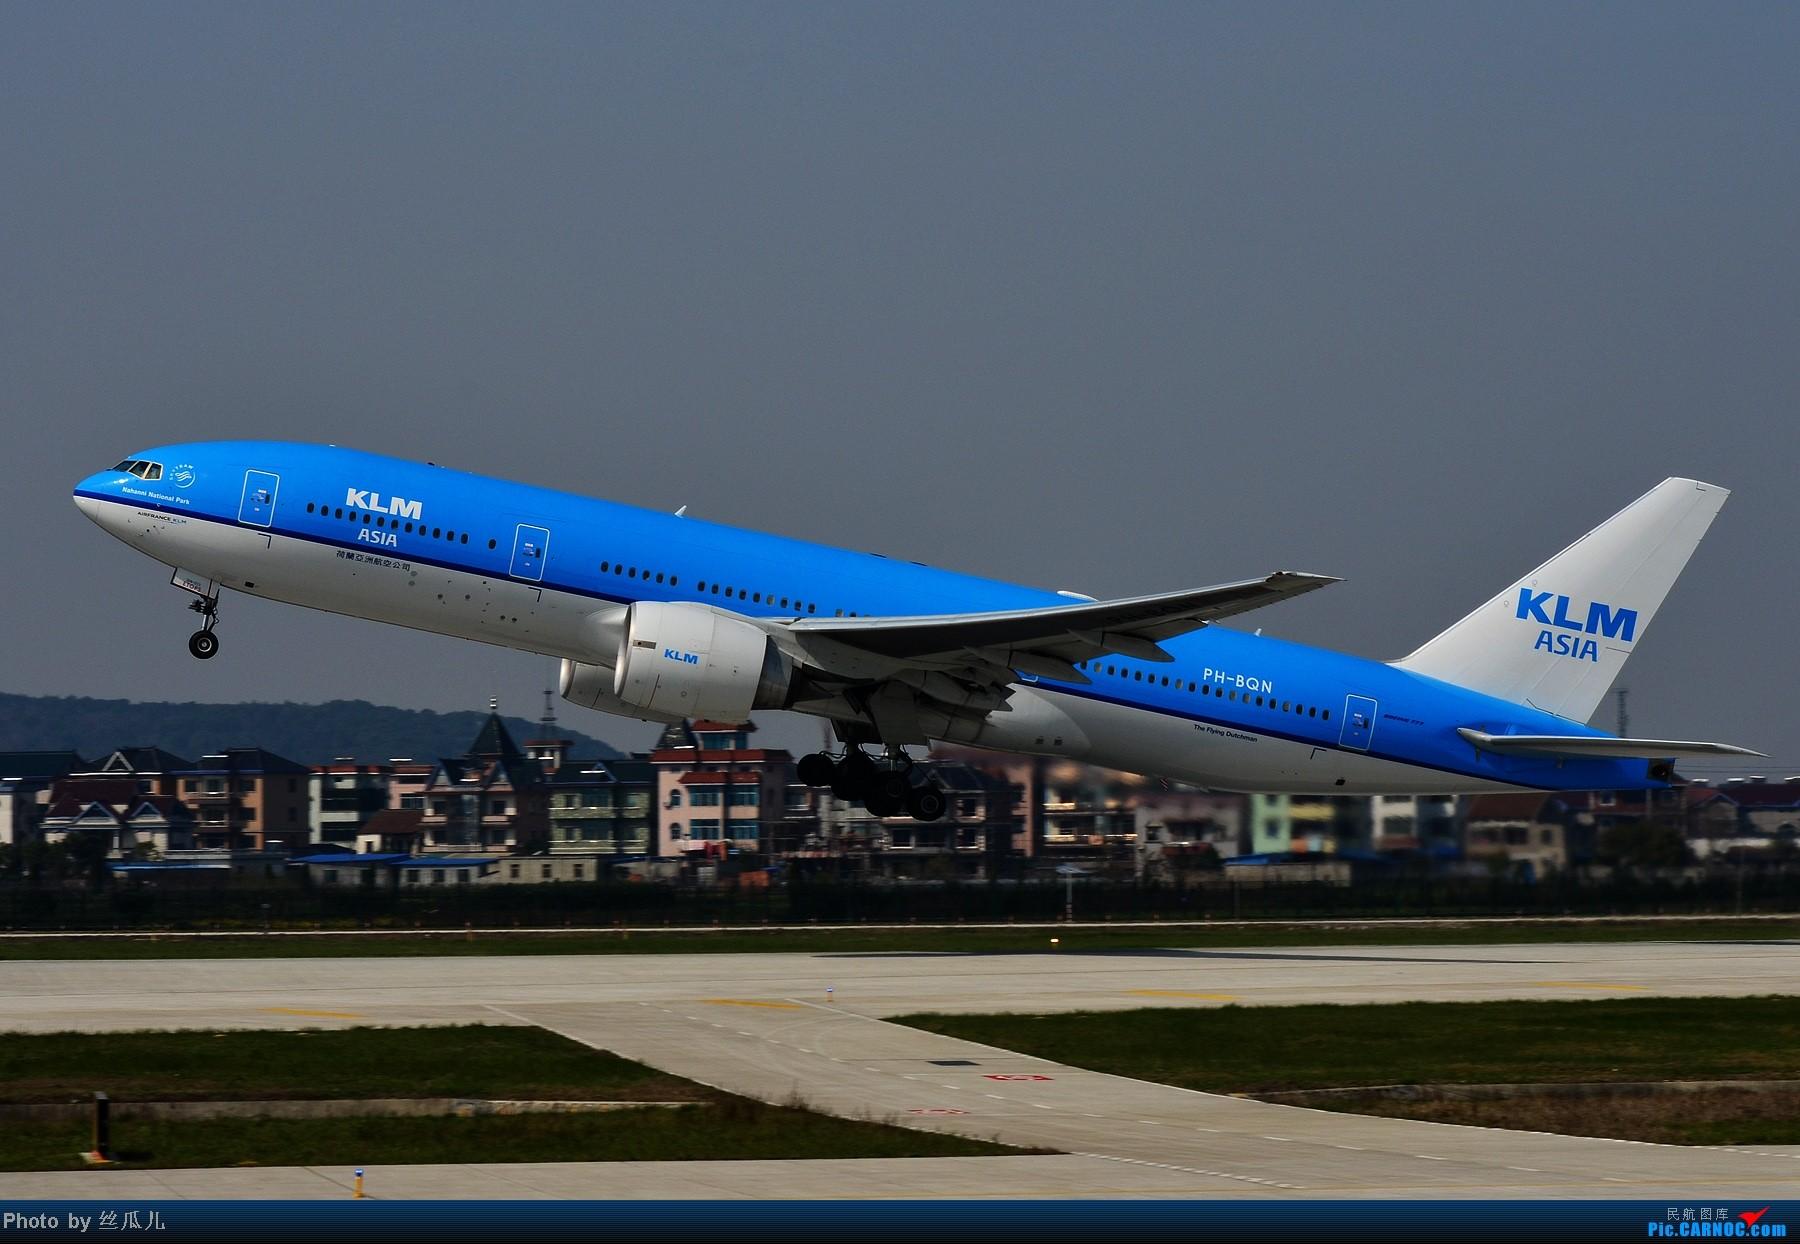 [原创]2013年3月3日-萧山机场-晴 BOEING 777-200 PH-BQN 中国杭州萧山机场